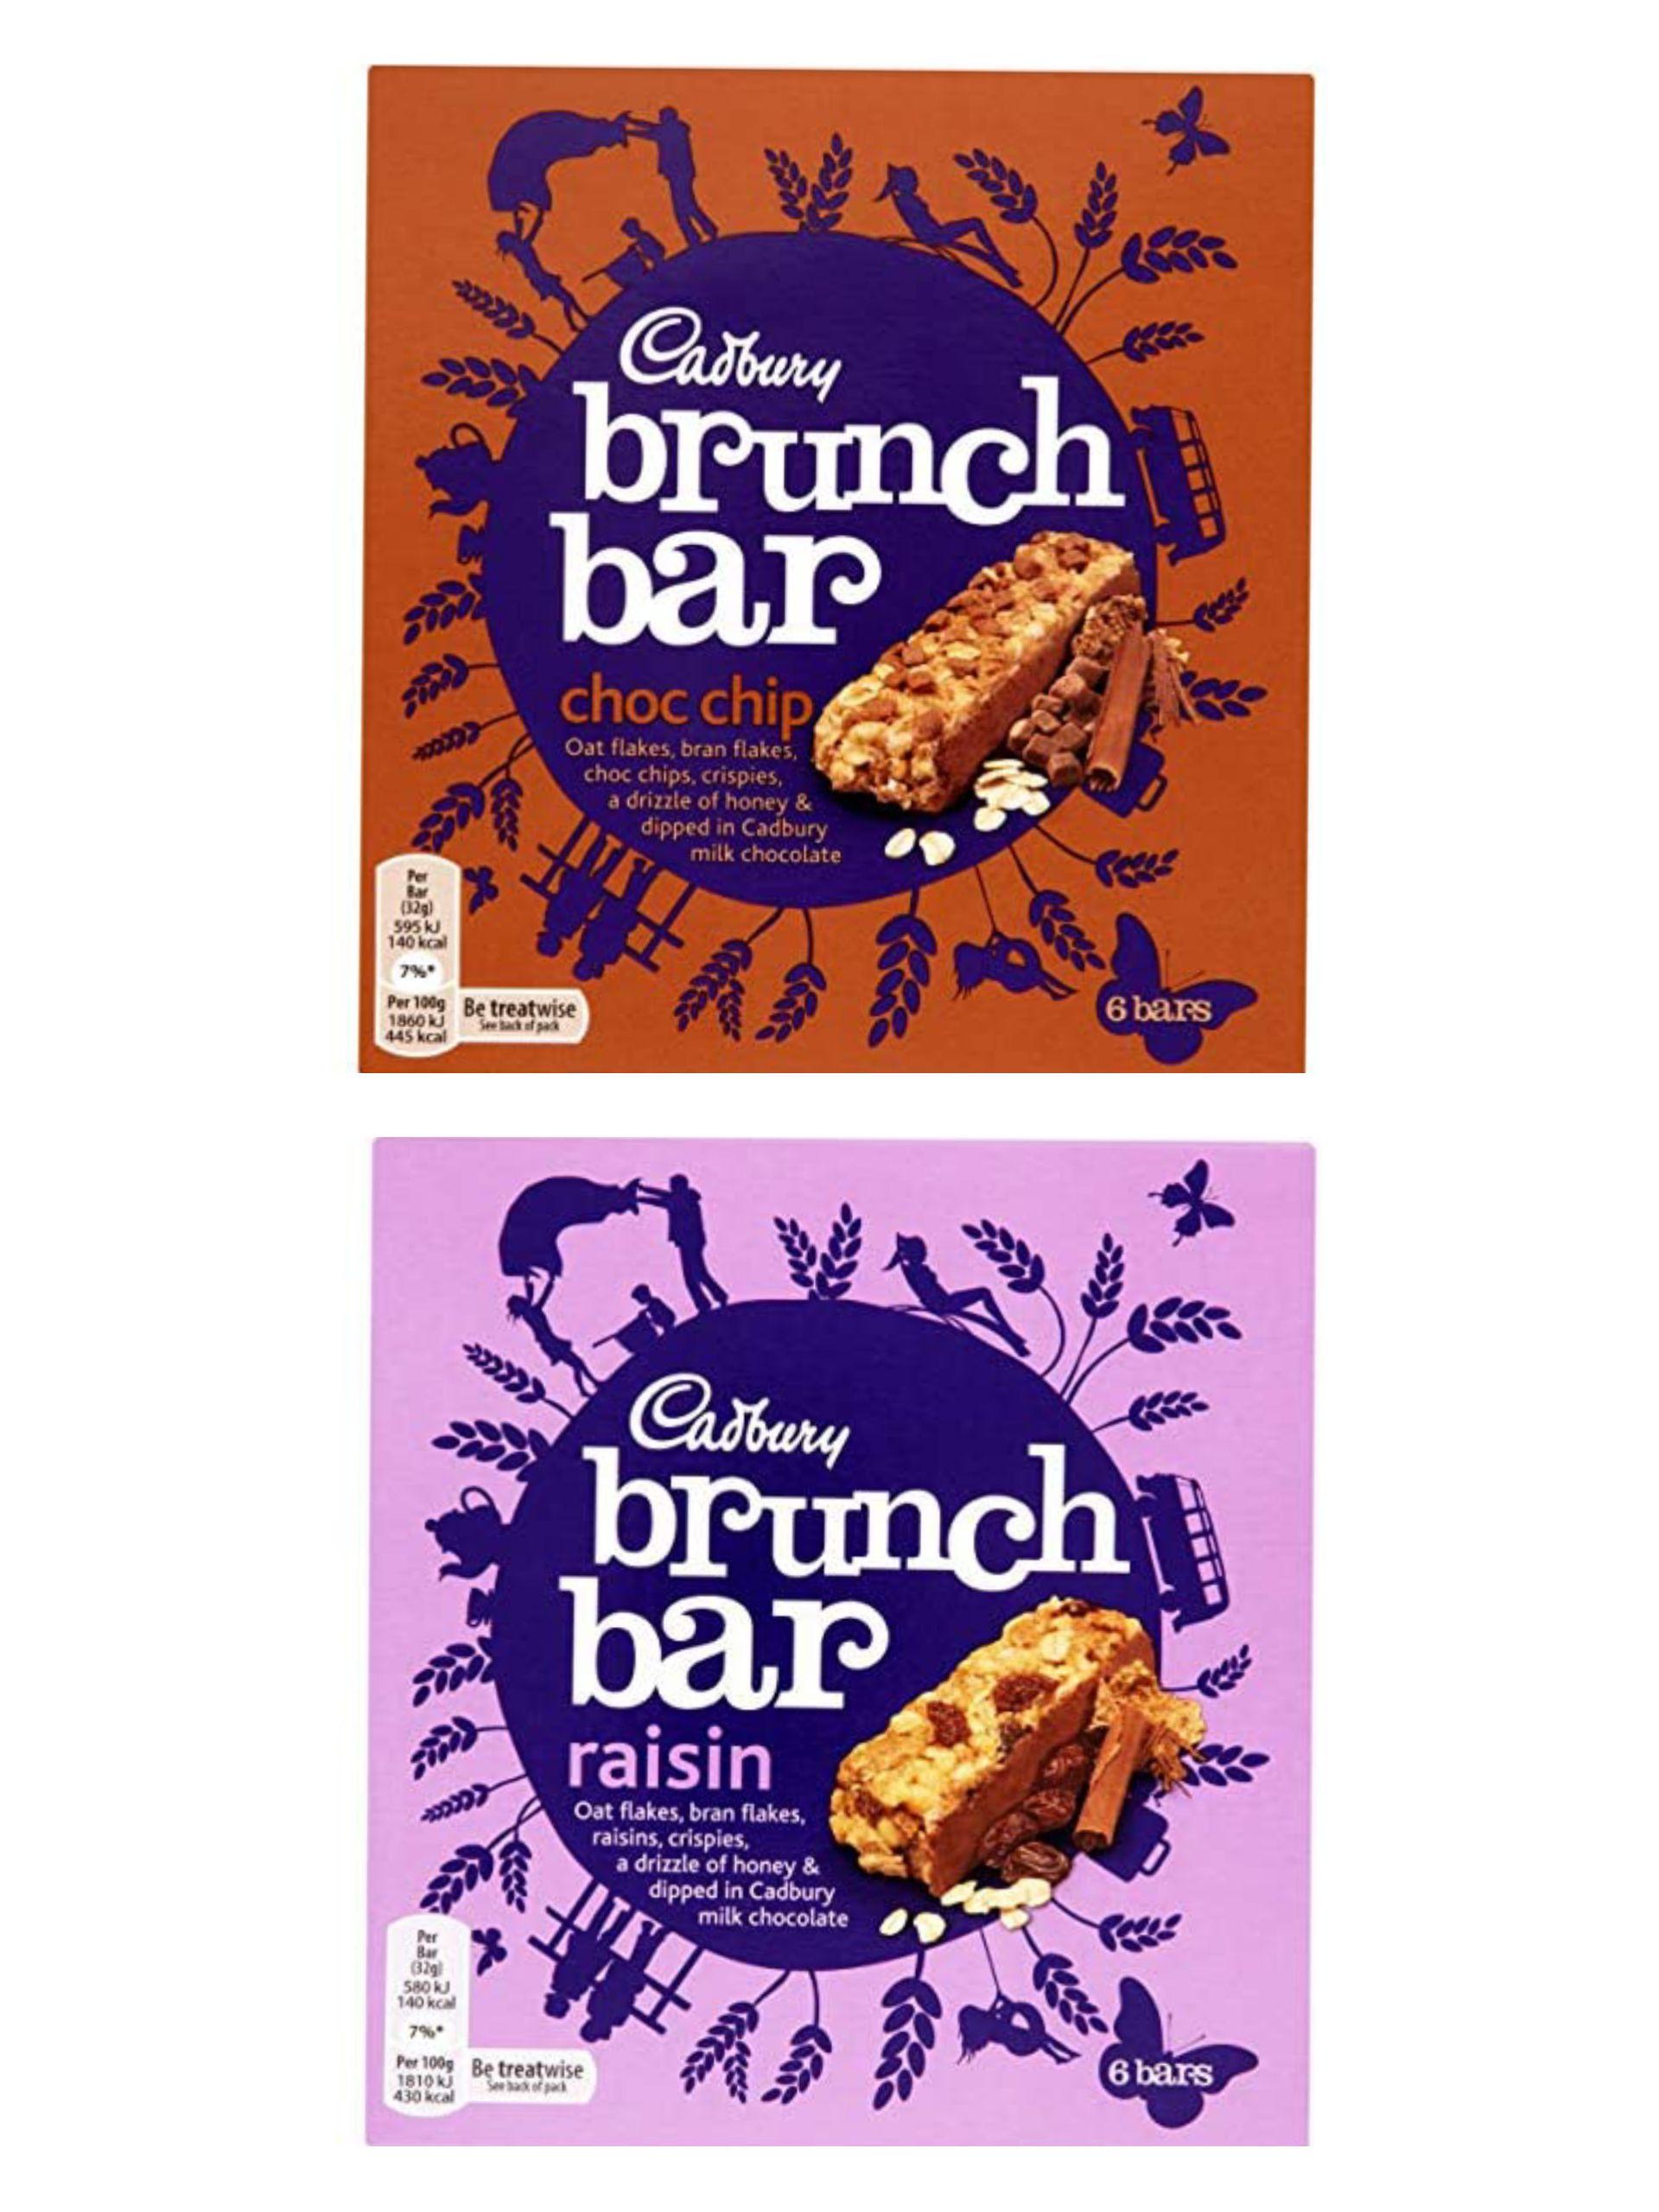 Cadbury Brunch Bar Chocolate Chip/Raisin 6 x 32g - 99p Prime / +£4.49 non Prime @ Amazon